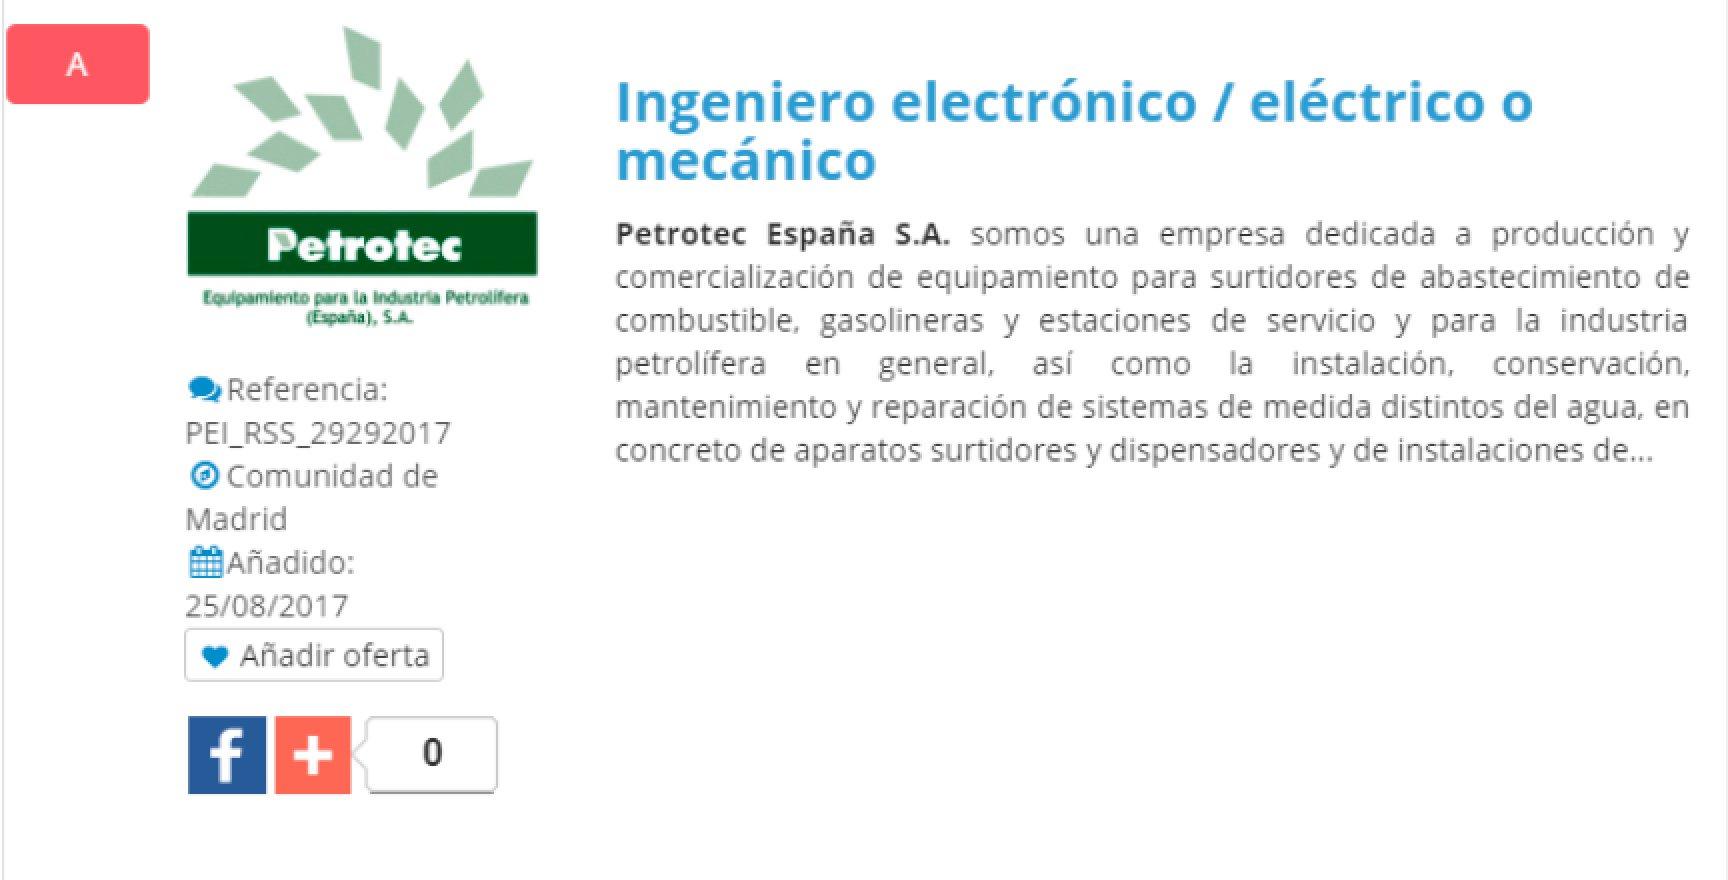 @proempleoing #empleo Ingeniero electrónico / eléctrico o mecánico - Madrid  https://t.co/O2KMb5wtSj https://t.co/Nxpl67HHau